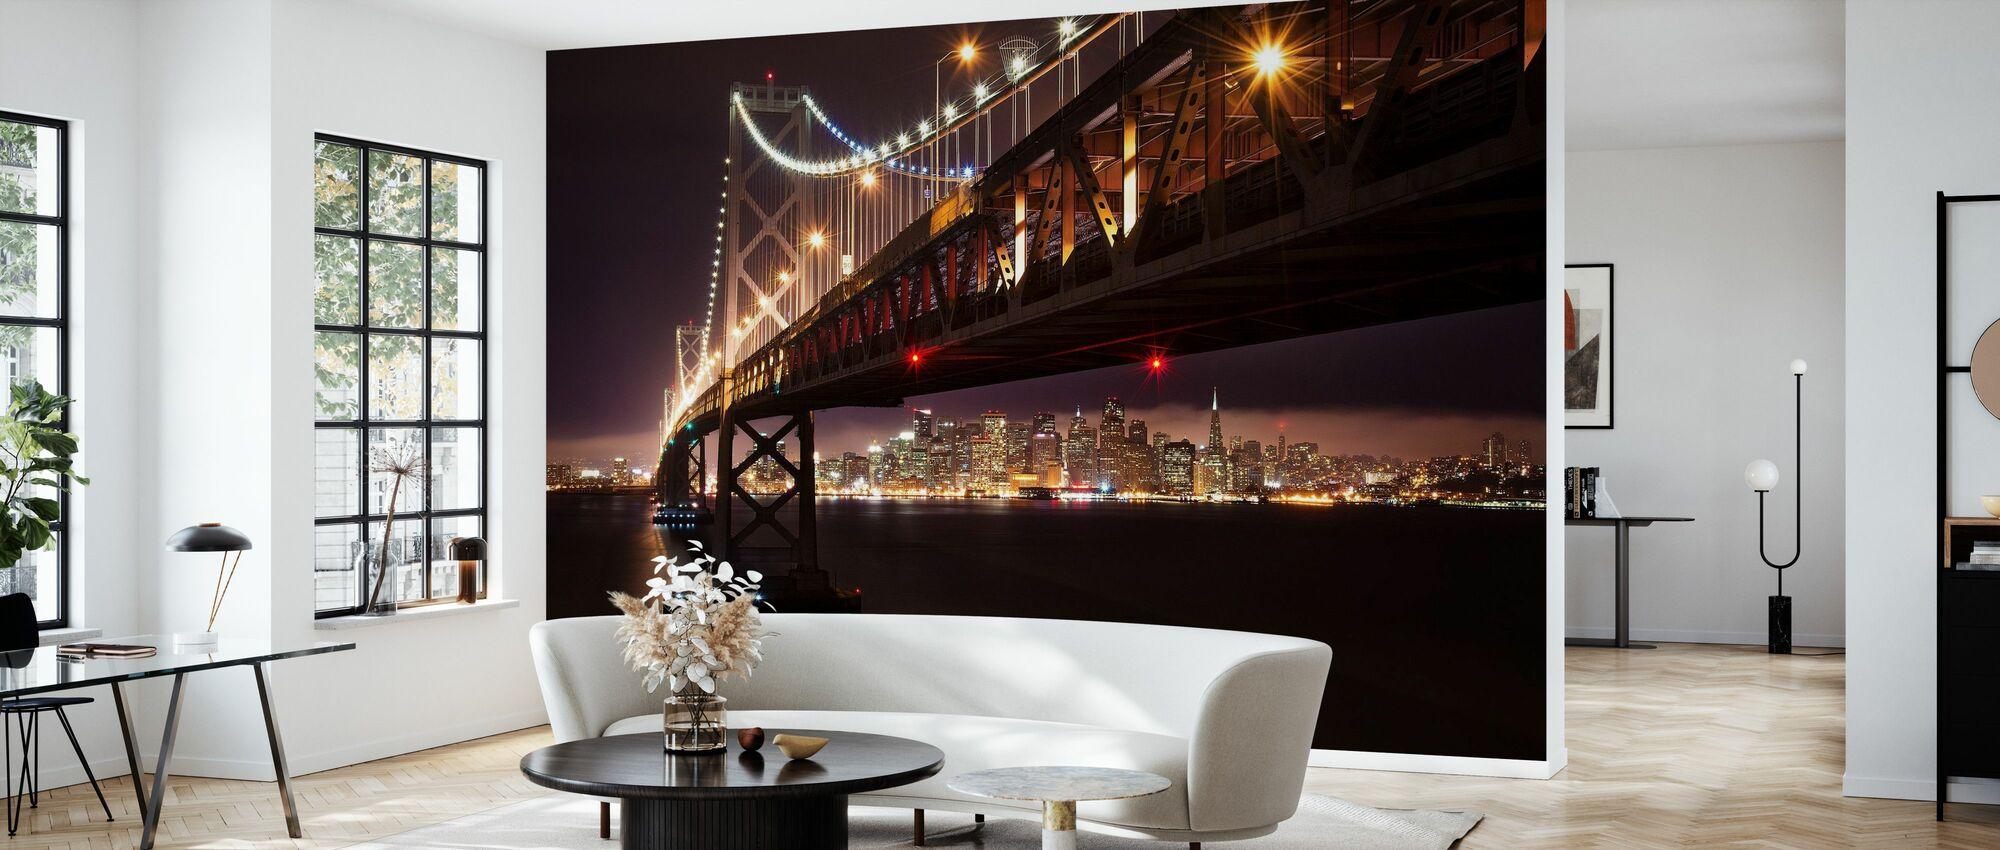 Bay Bridge in the Night - Wallpaper - Living Room